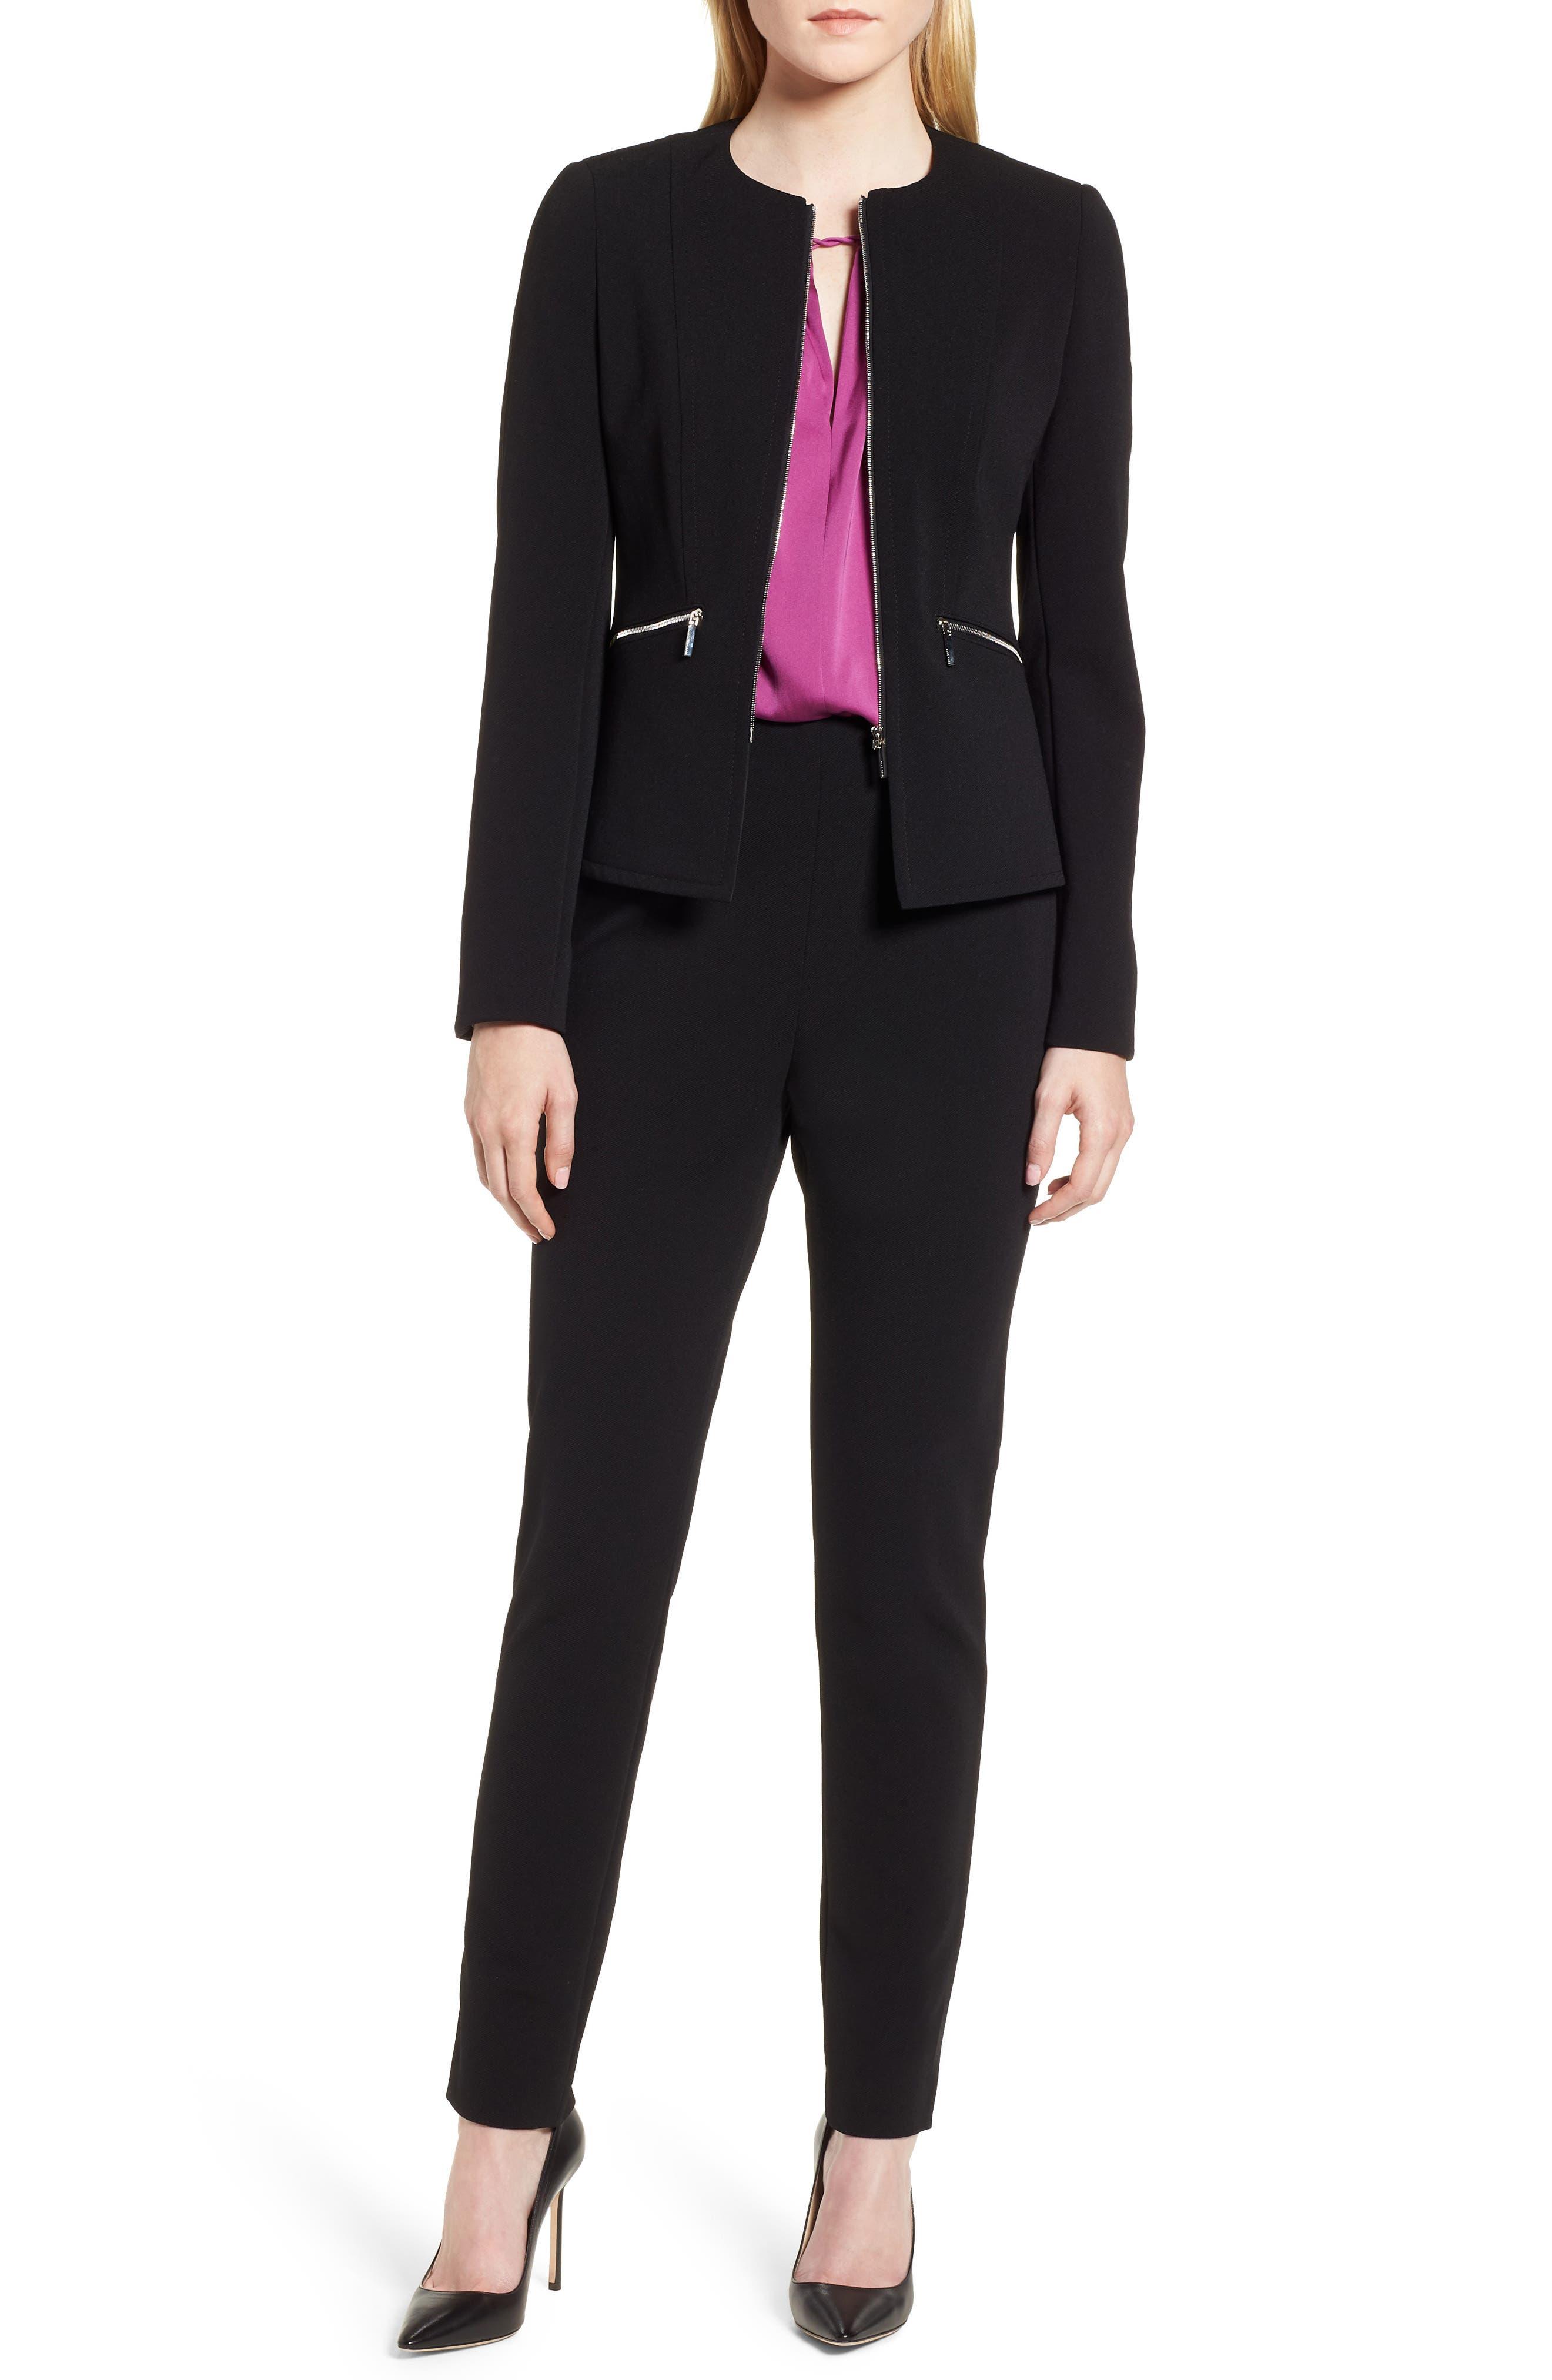 Tilezea Twill Jersey Trousers,                             Alternate thumbnail 8, color,                             Black